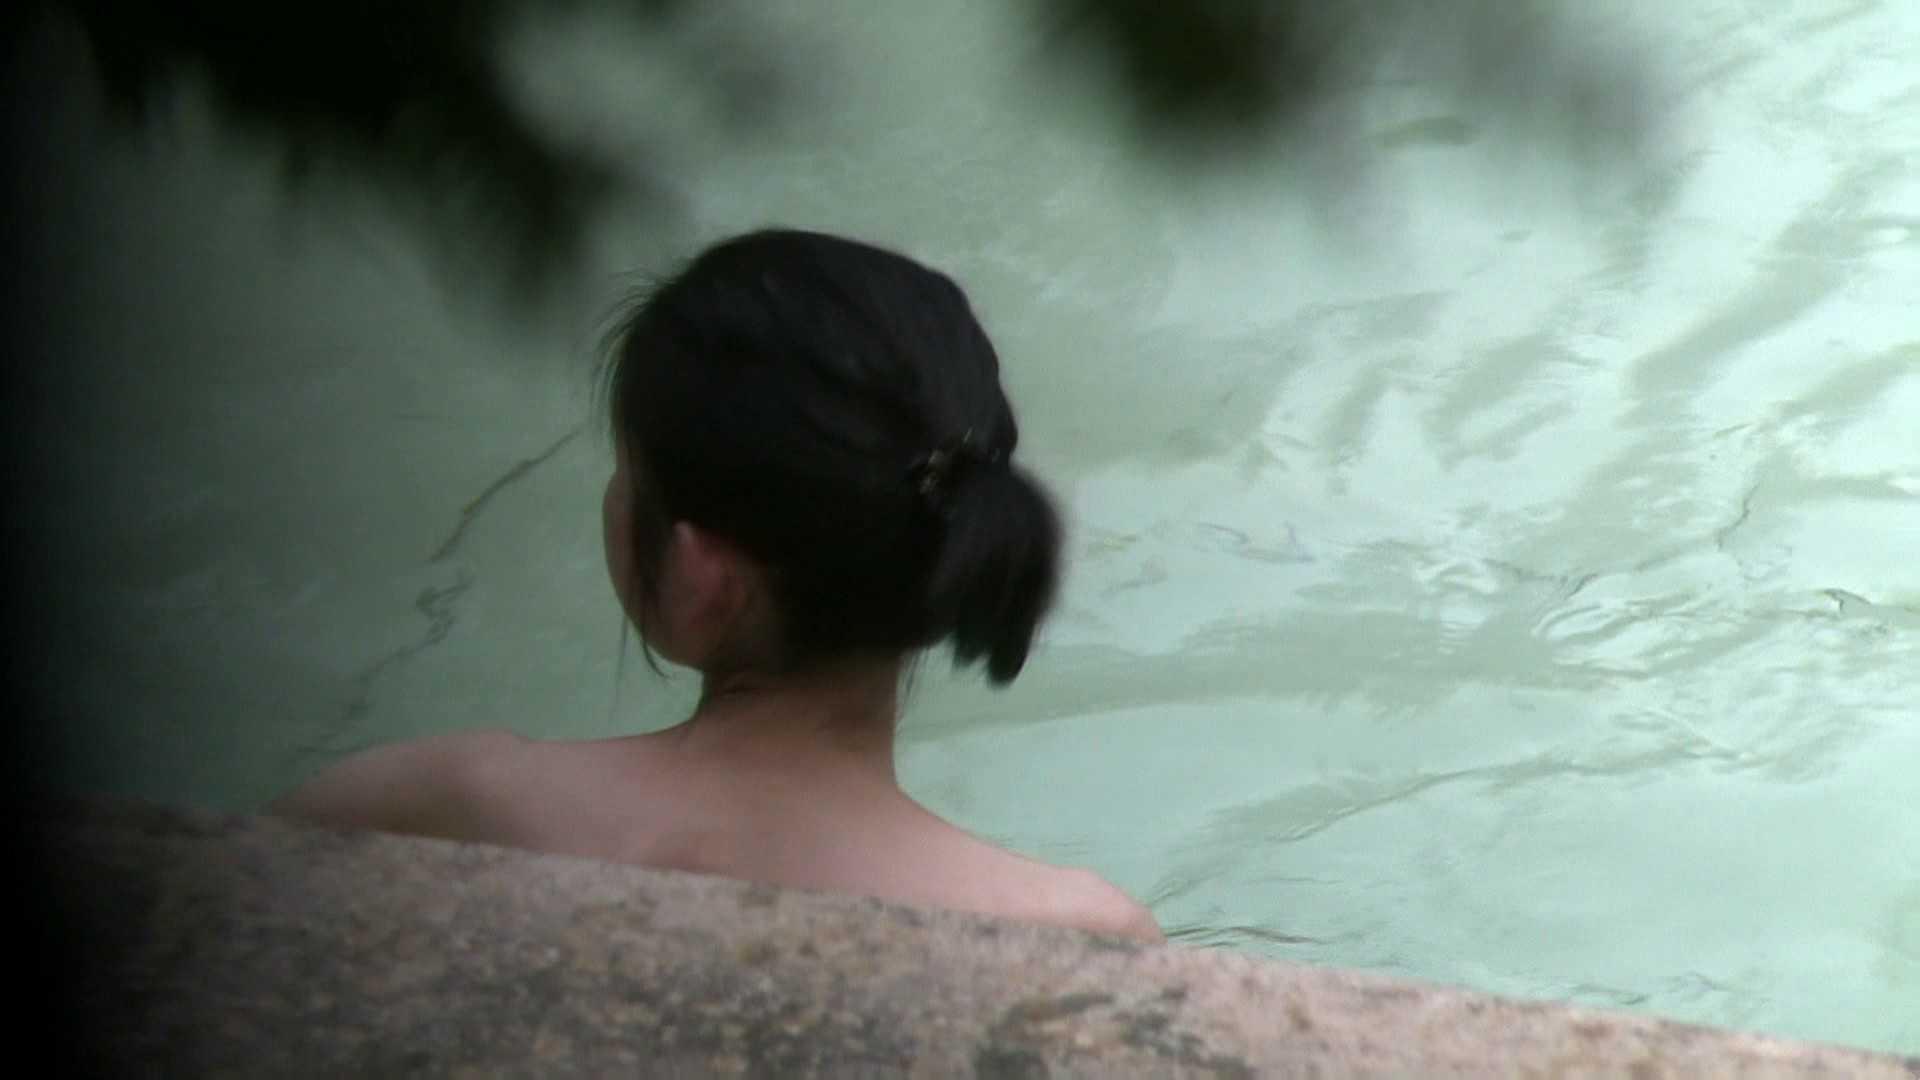 Aquaな露天風呂Vol.656 OLセックス   露天  72画像 10